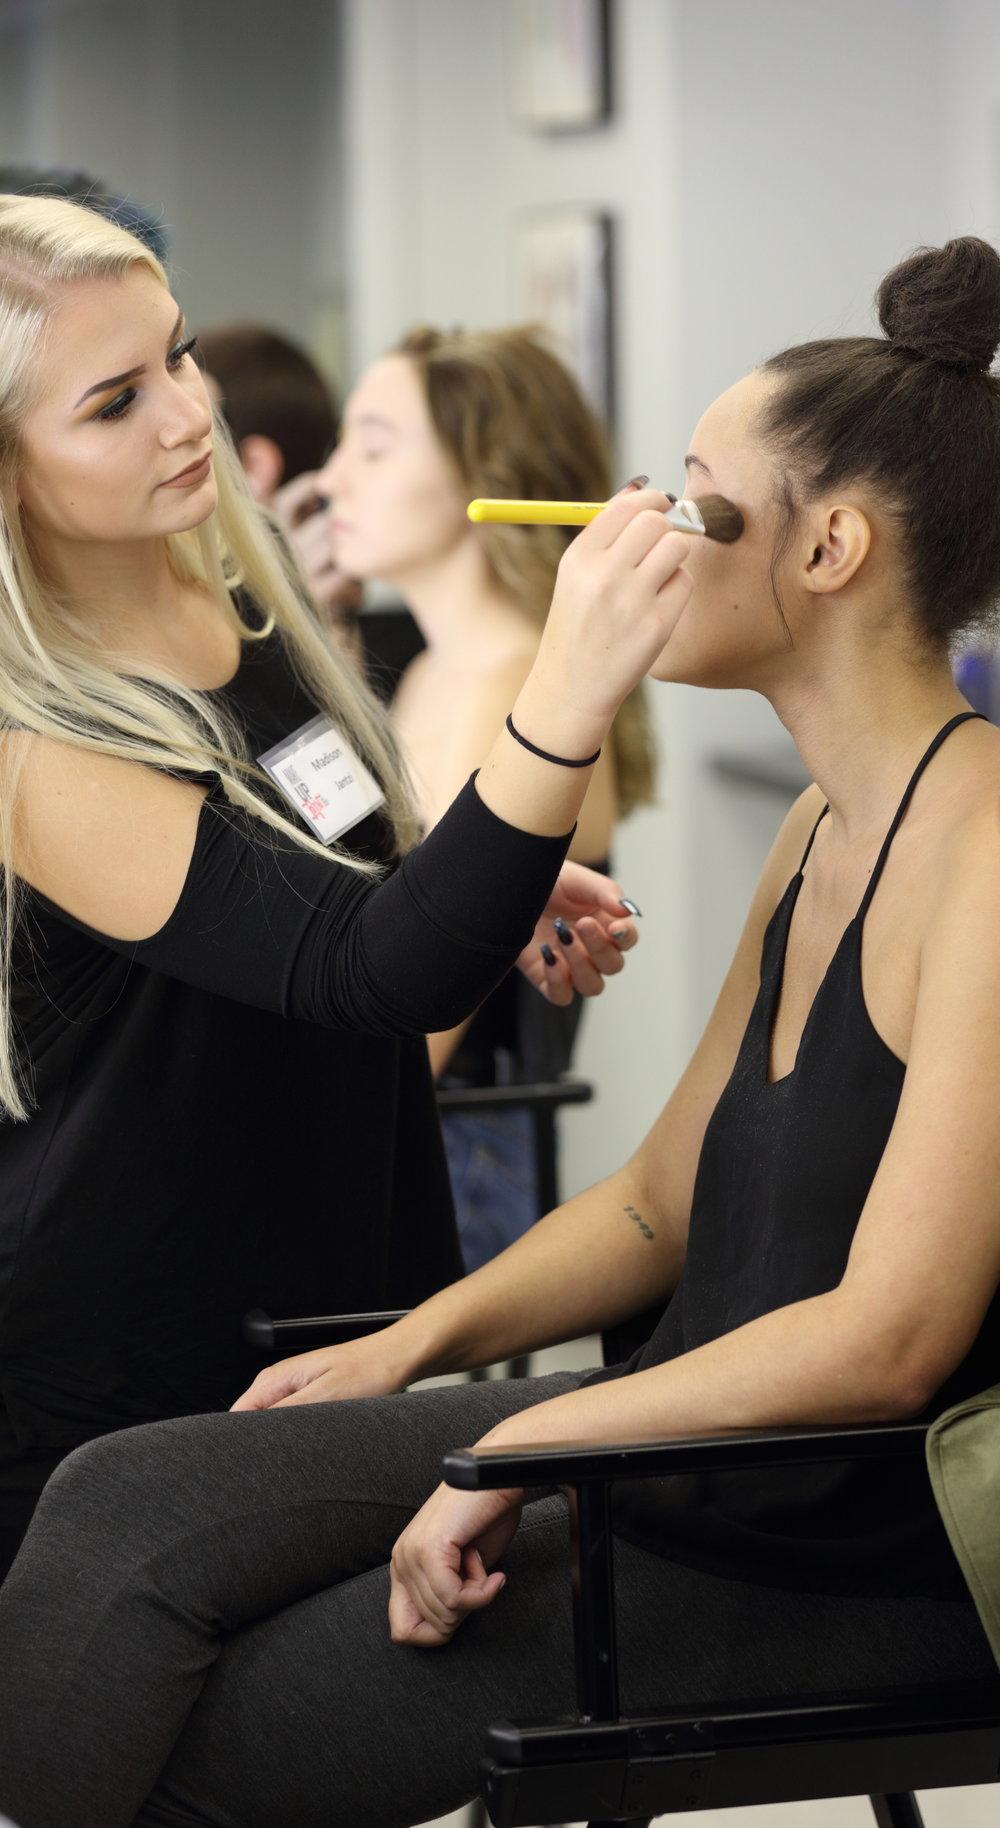 Basic Makeup I